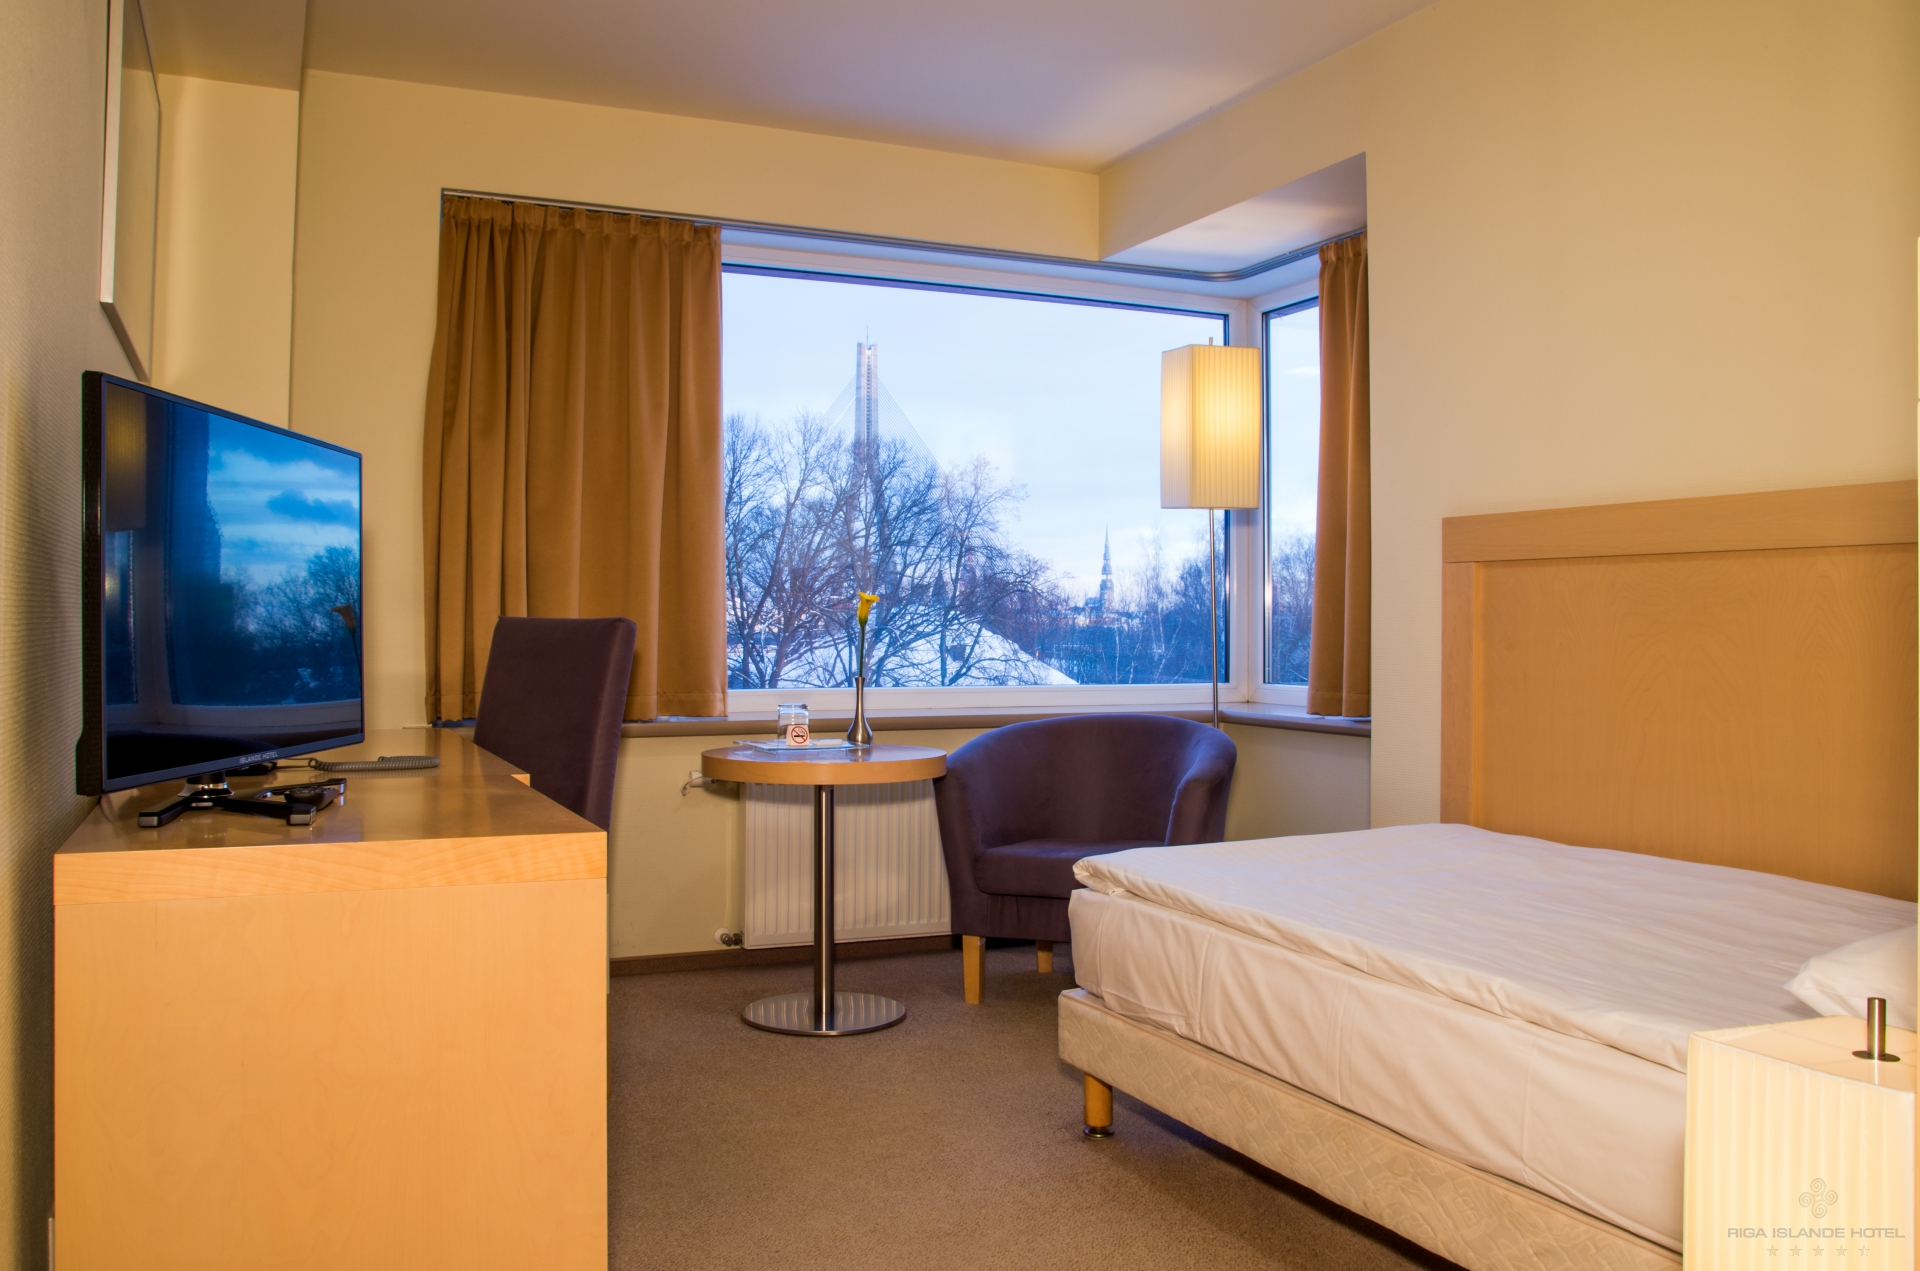 Riga Islande Hotel enkelrum(5-12 juli)